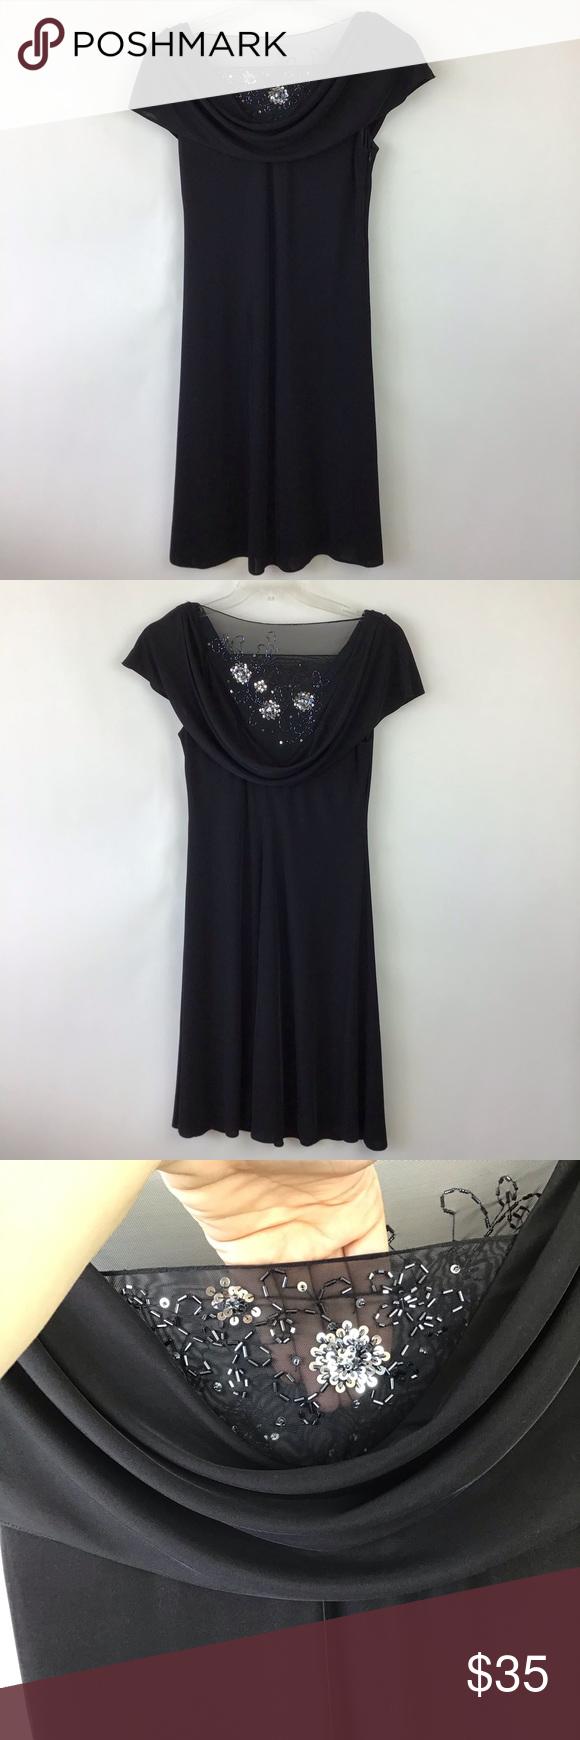 Patra Black Beaded Dress Size 12 Evening Black Beaded Dress Beaded Dress Dresses [ 1740 x 580 Pixel ]